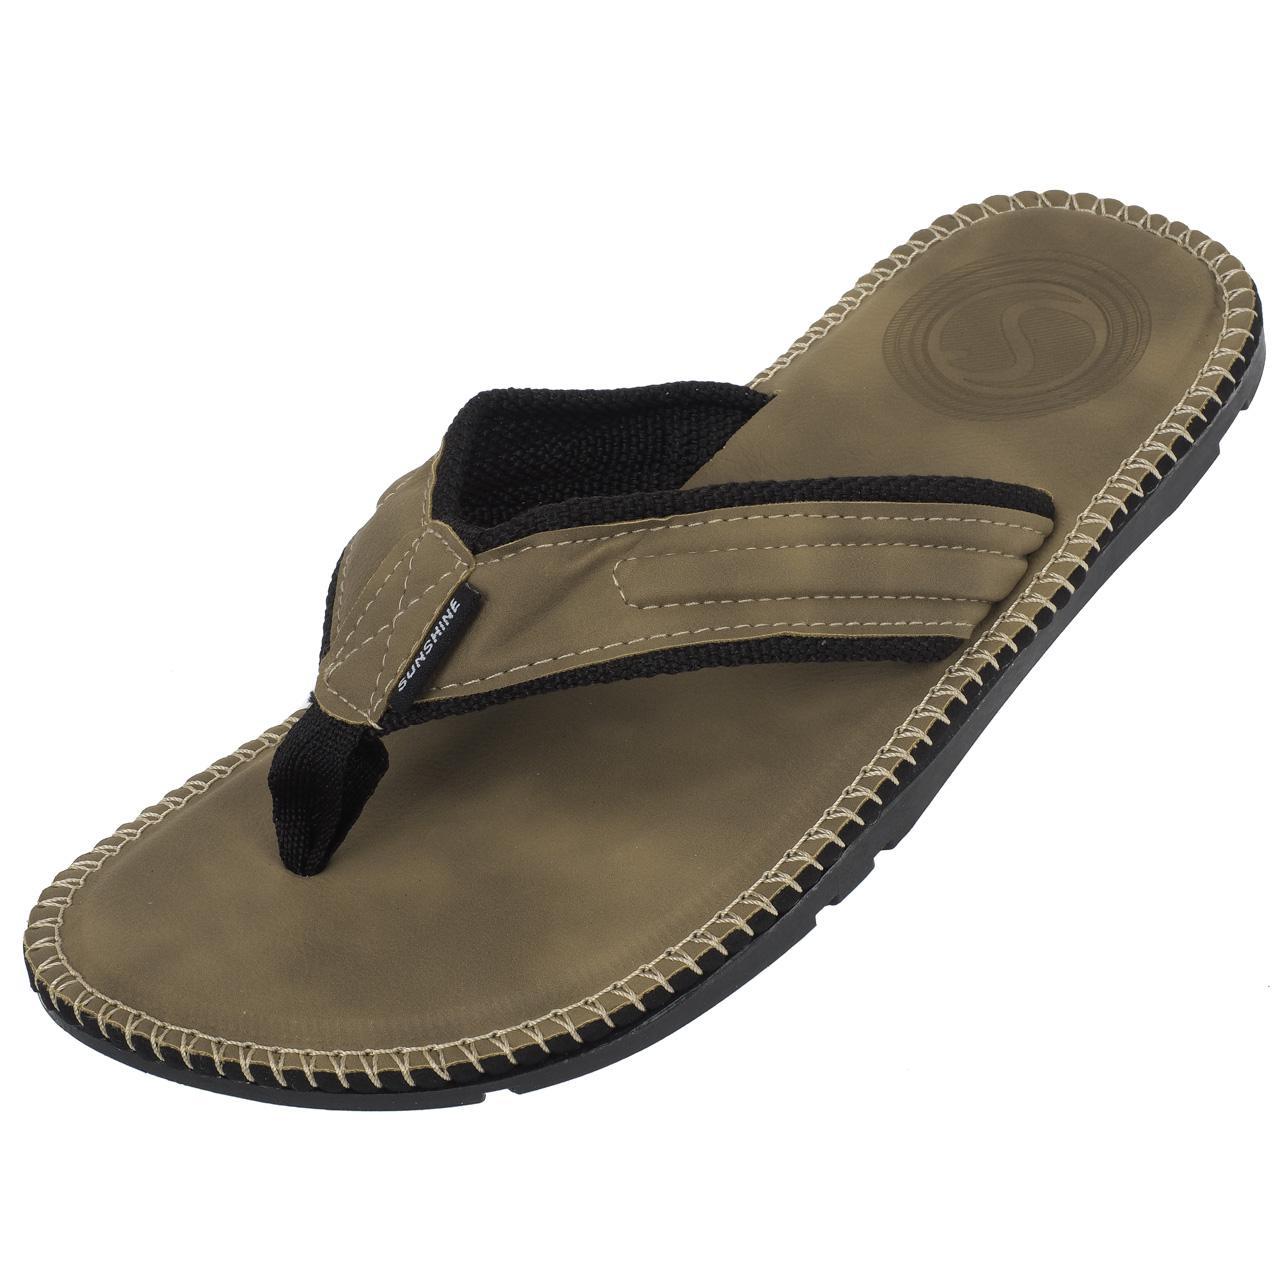 Flip-Flops-Tap-Dance-Shoes-Treeker9-Barbados-Beige-Flip-Flop-H-Beige-77481-New